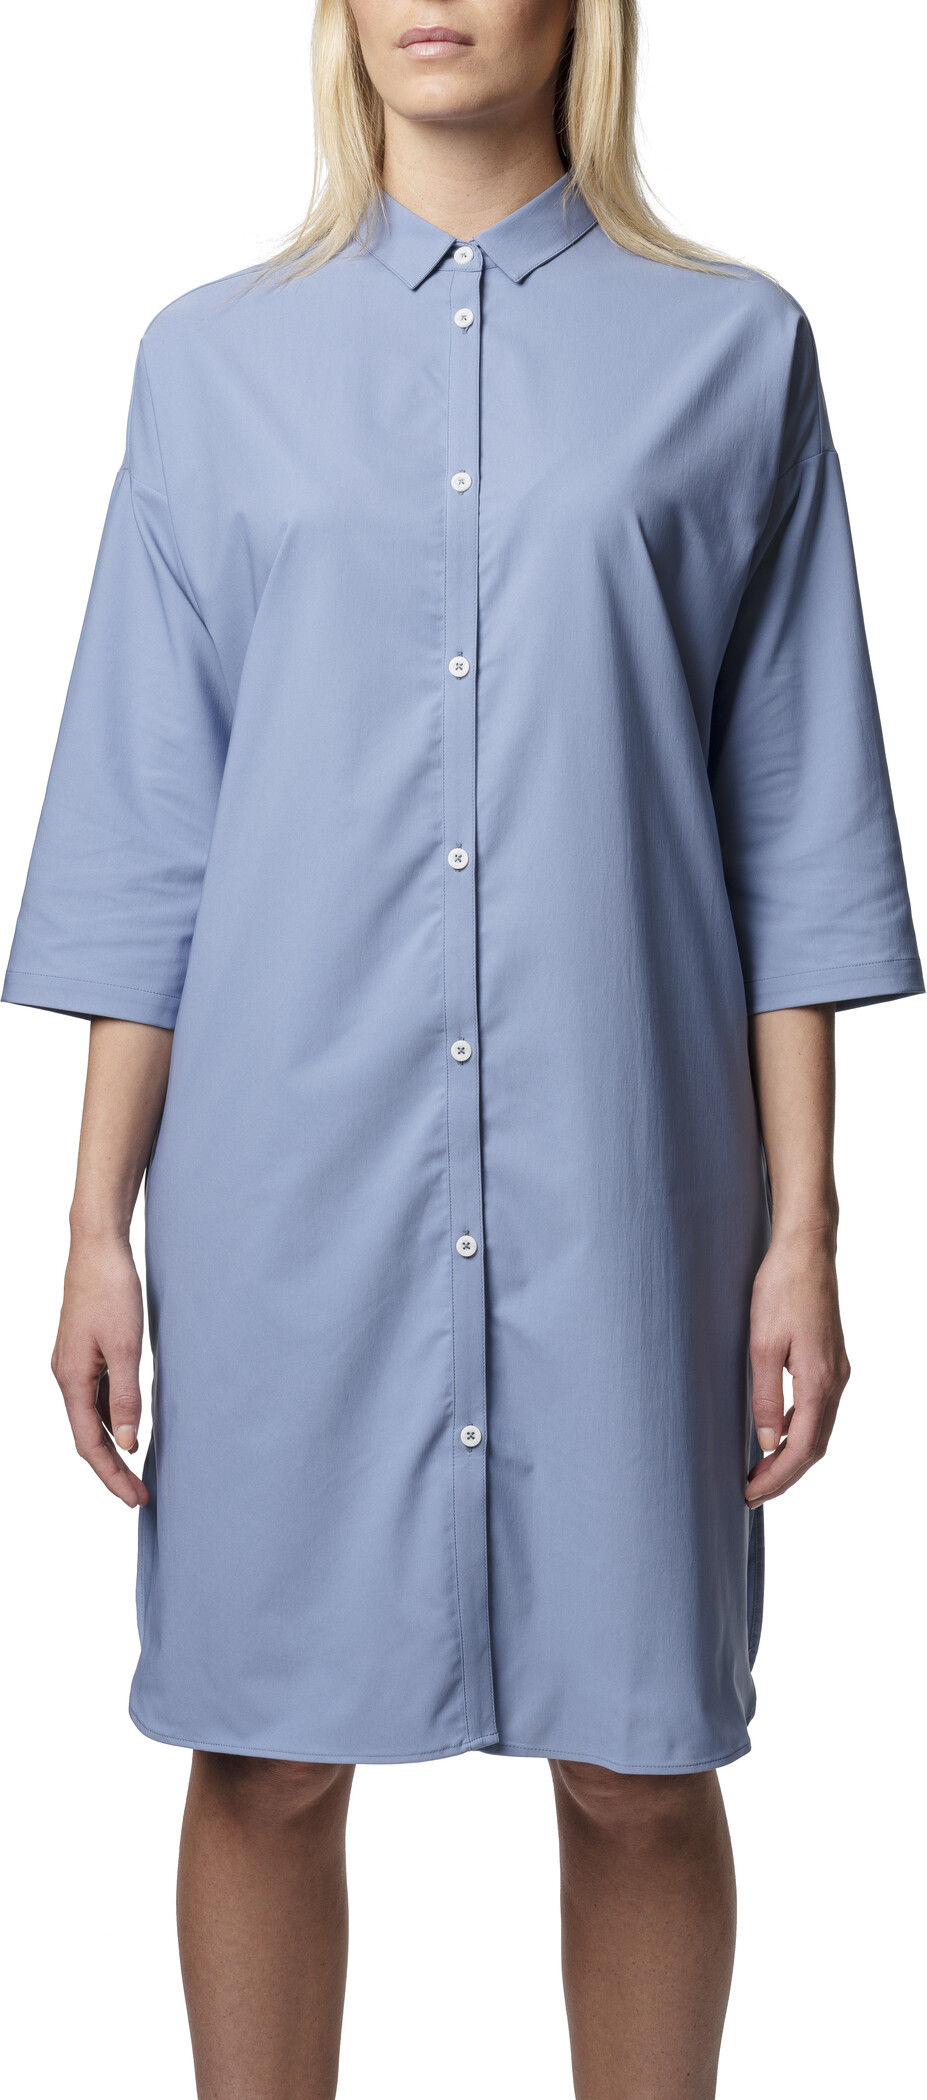 Houdini W's Trail Shirt Dress • Se pris (3 butiker) hos